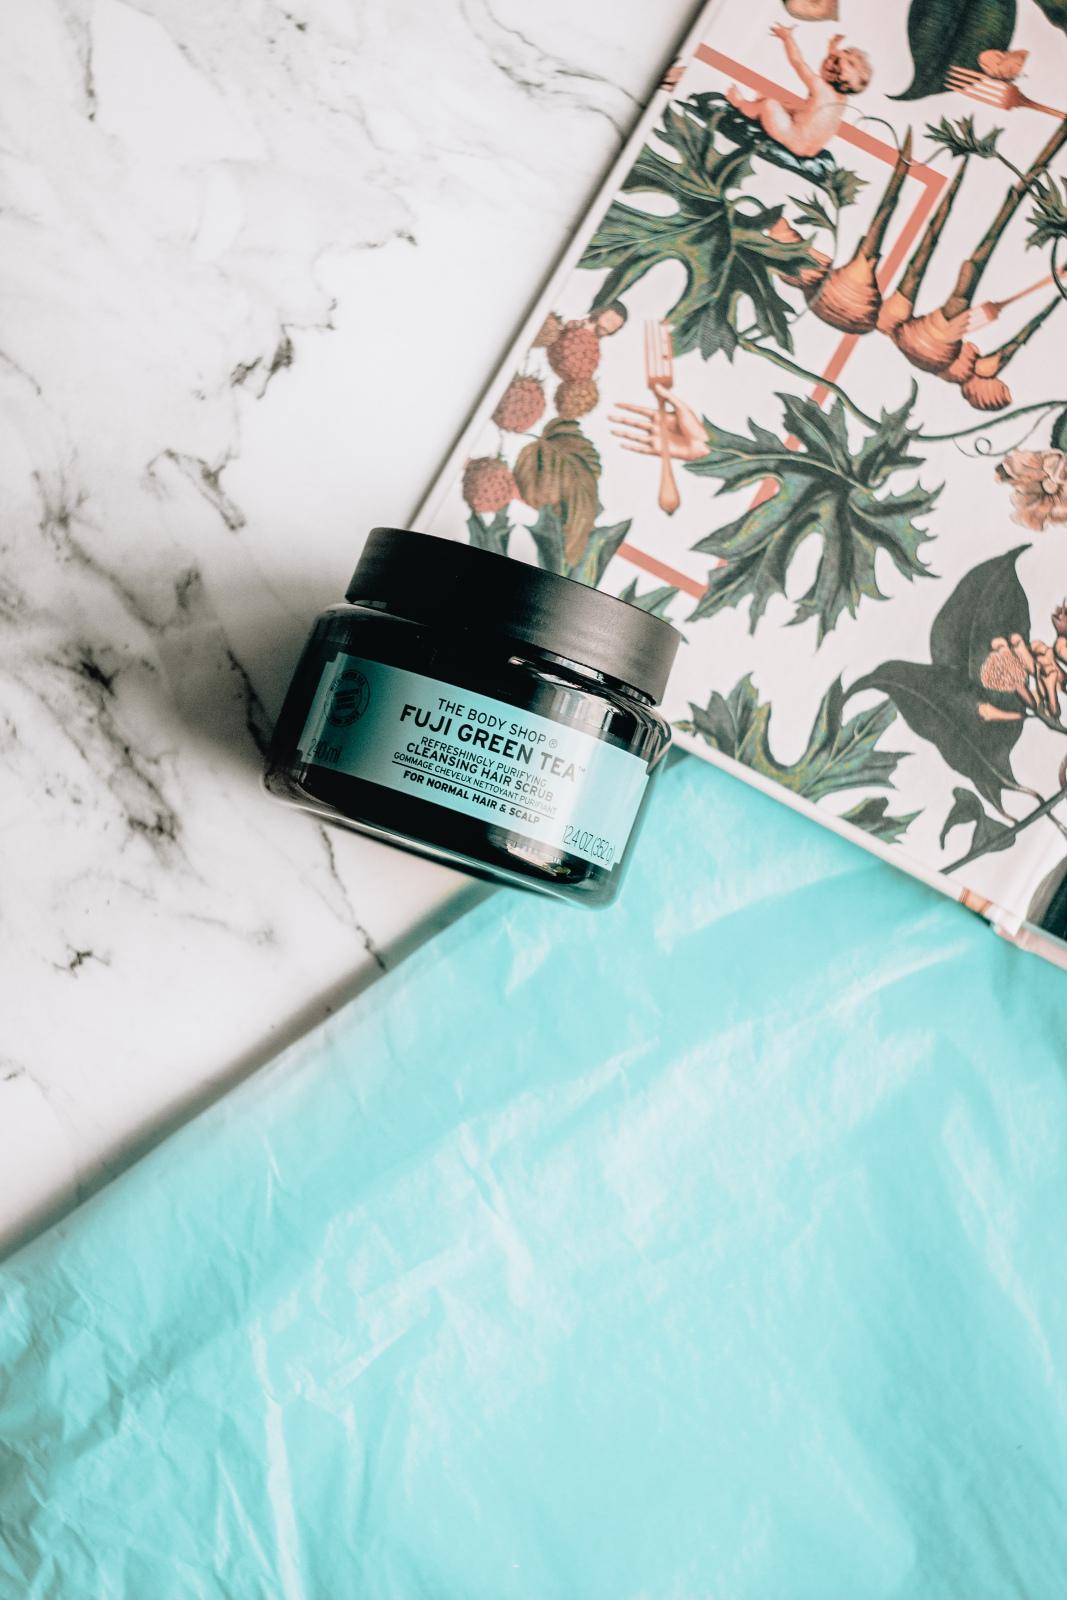 The Body Shop Fuji Green Tea Refreshingly Purifying Cleansing Hair Scrub hair scrub scalp scrub